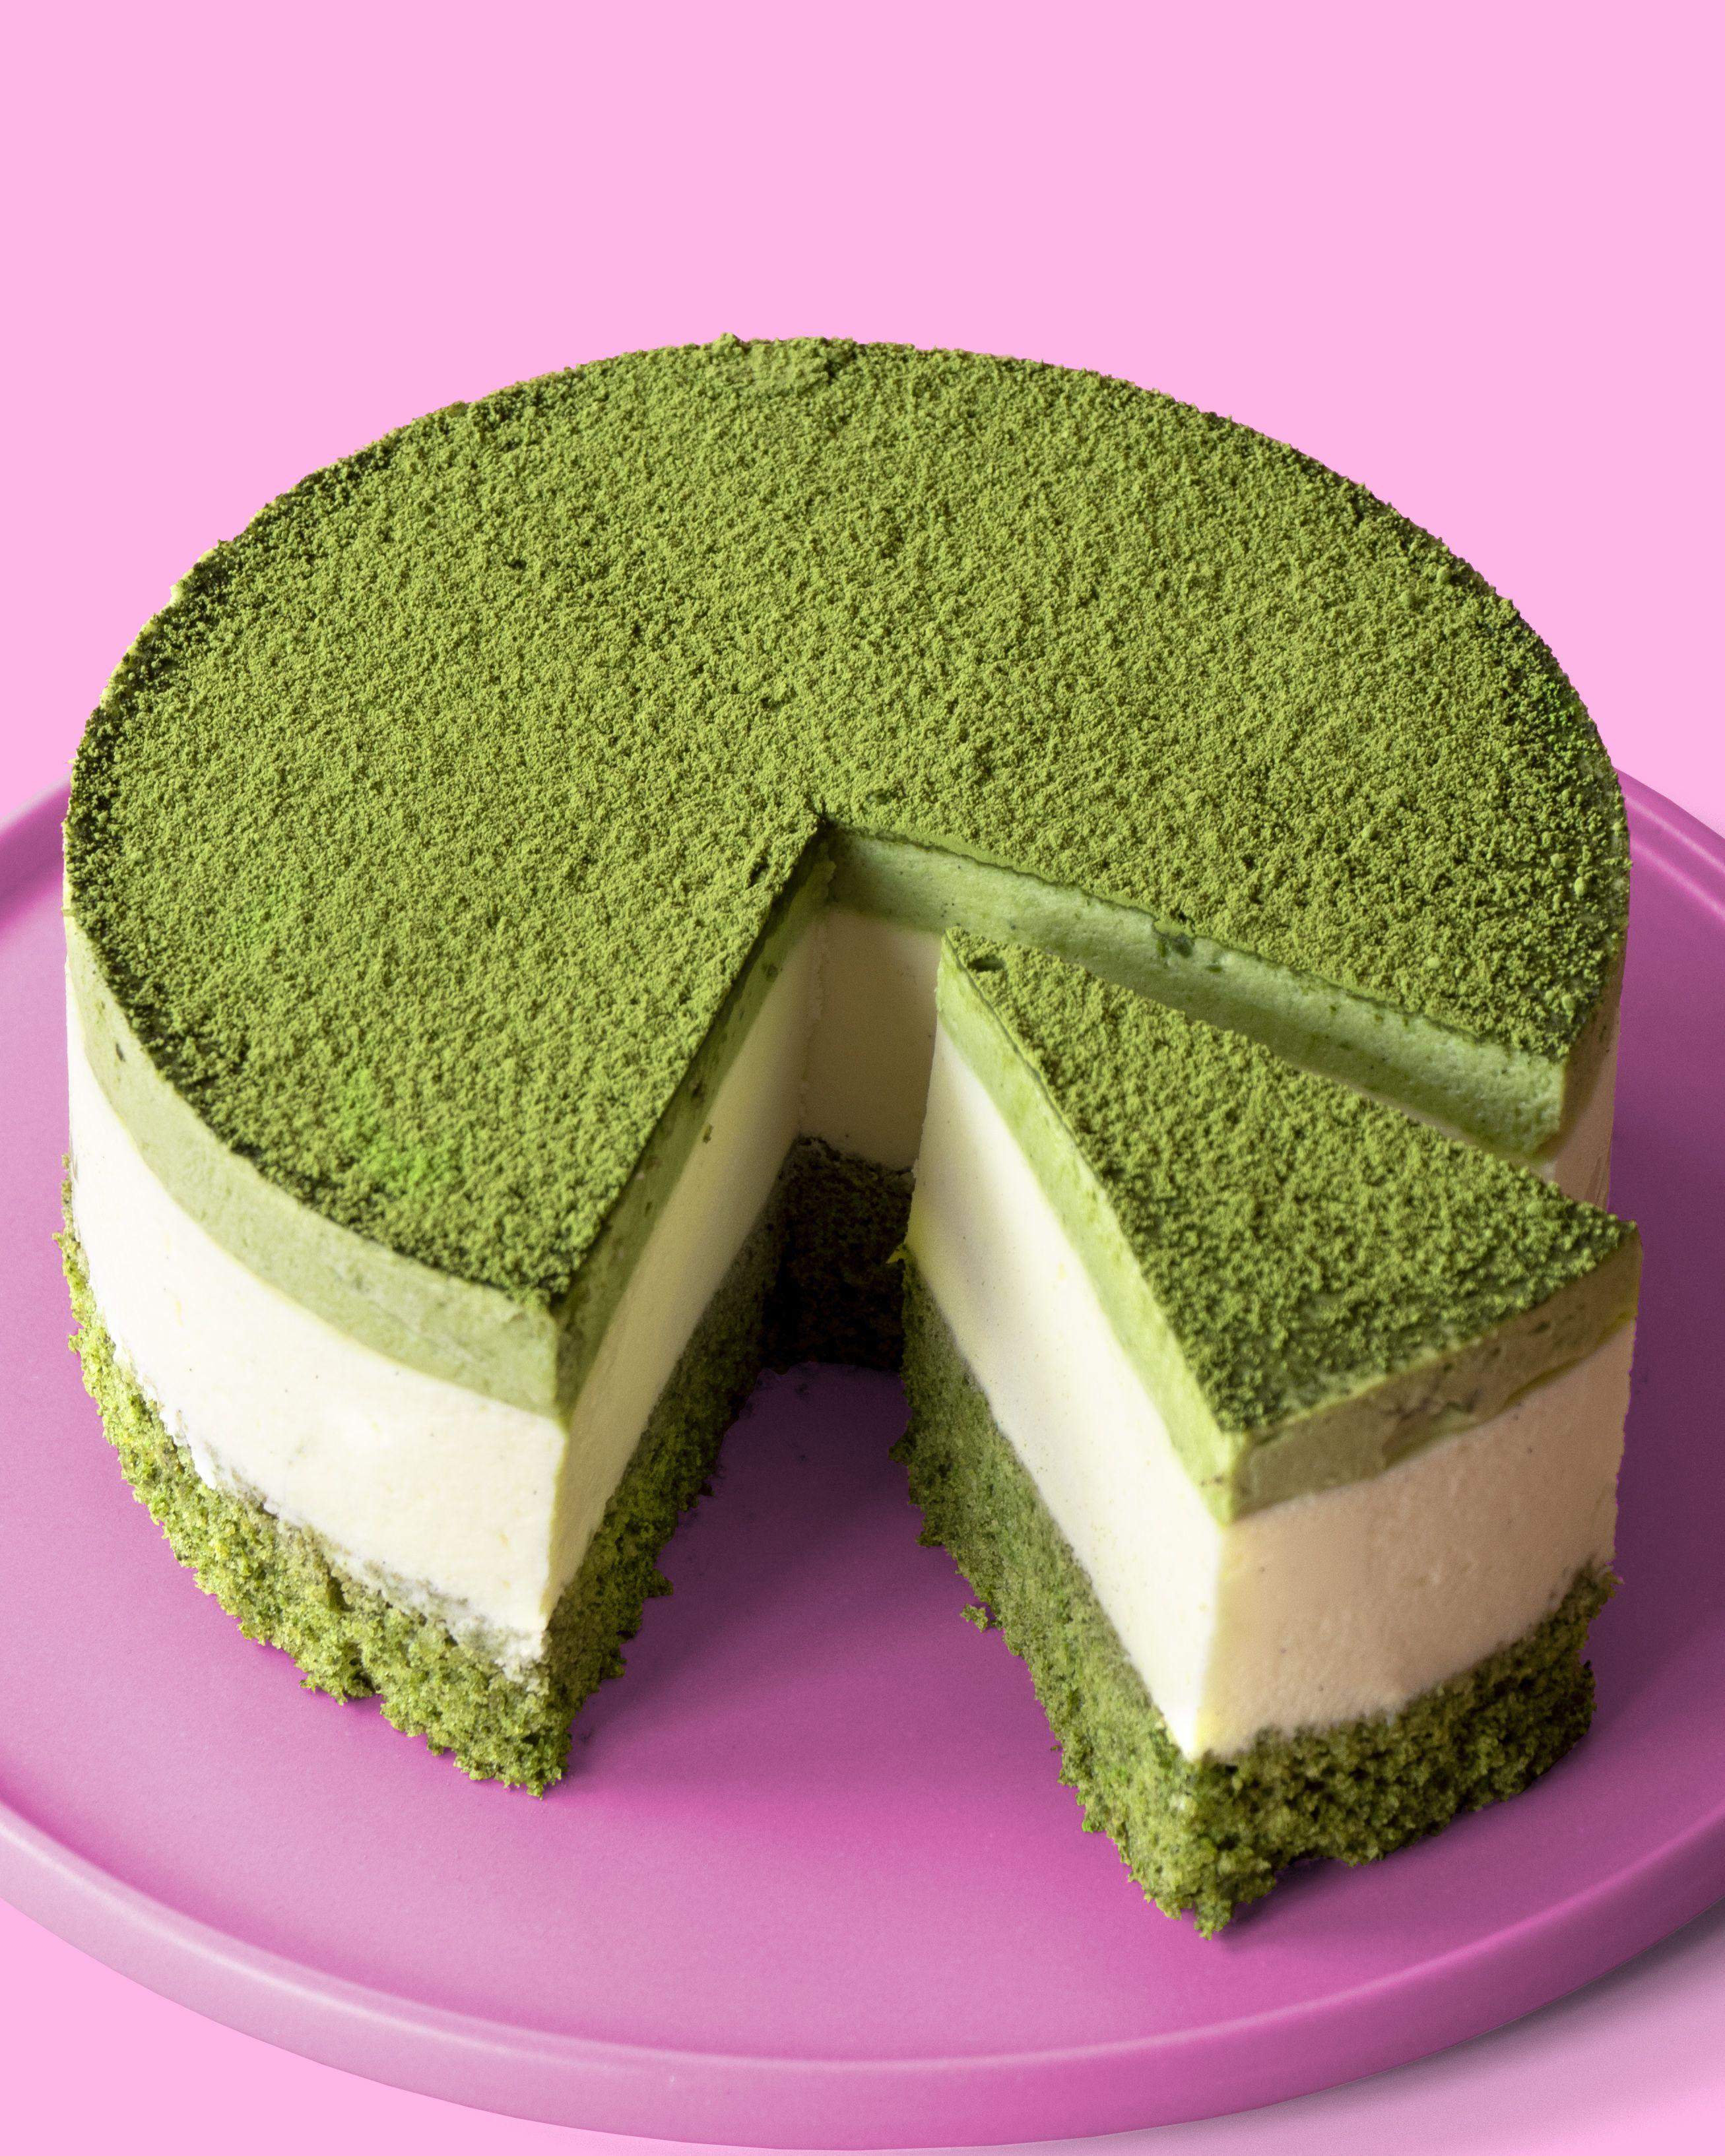 White Chocolate And Matcha Mousse Cake